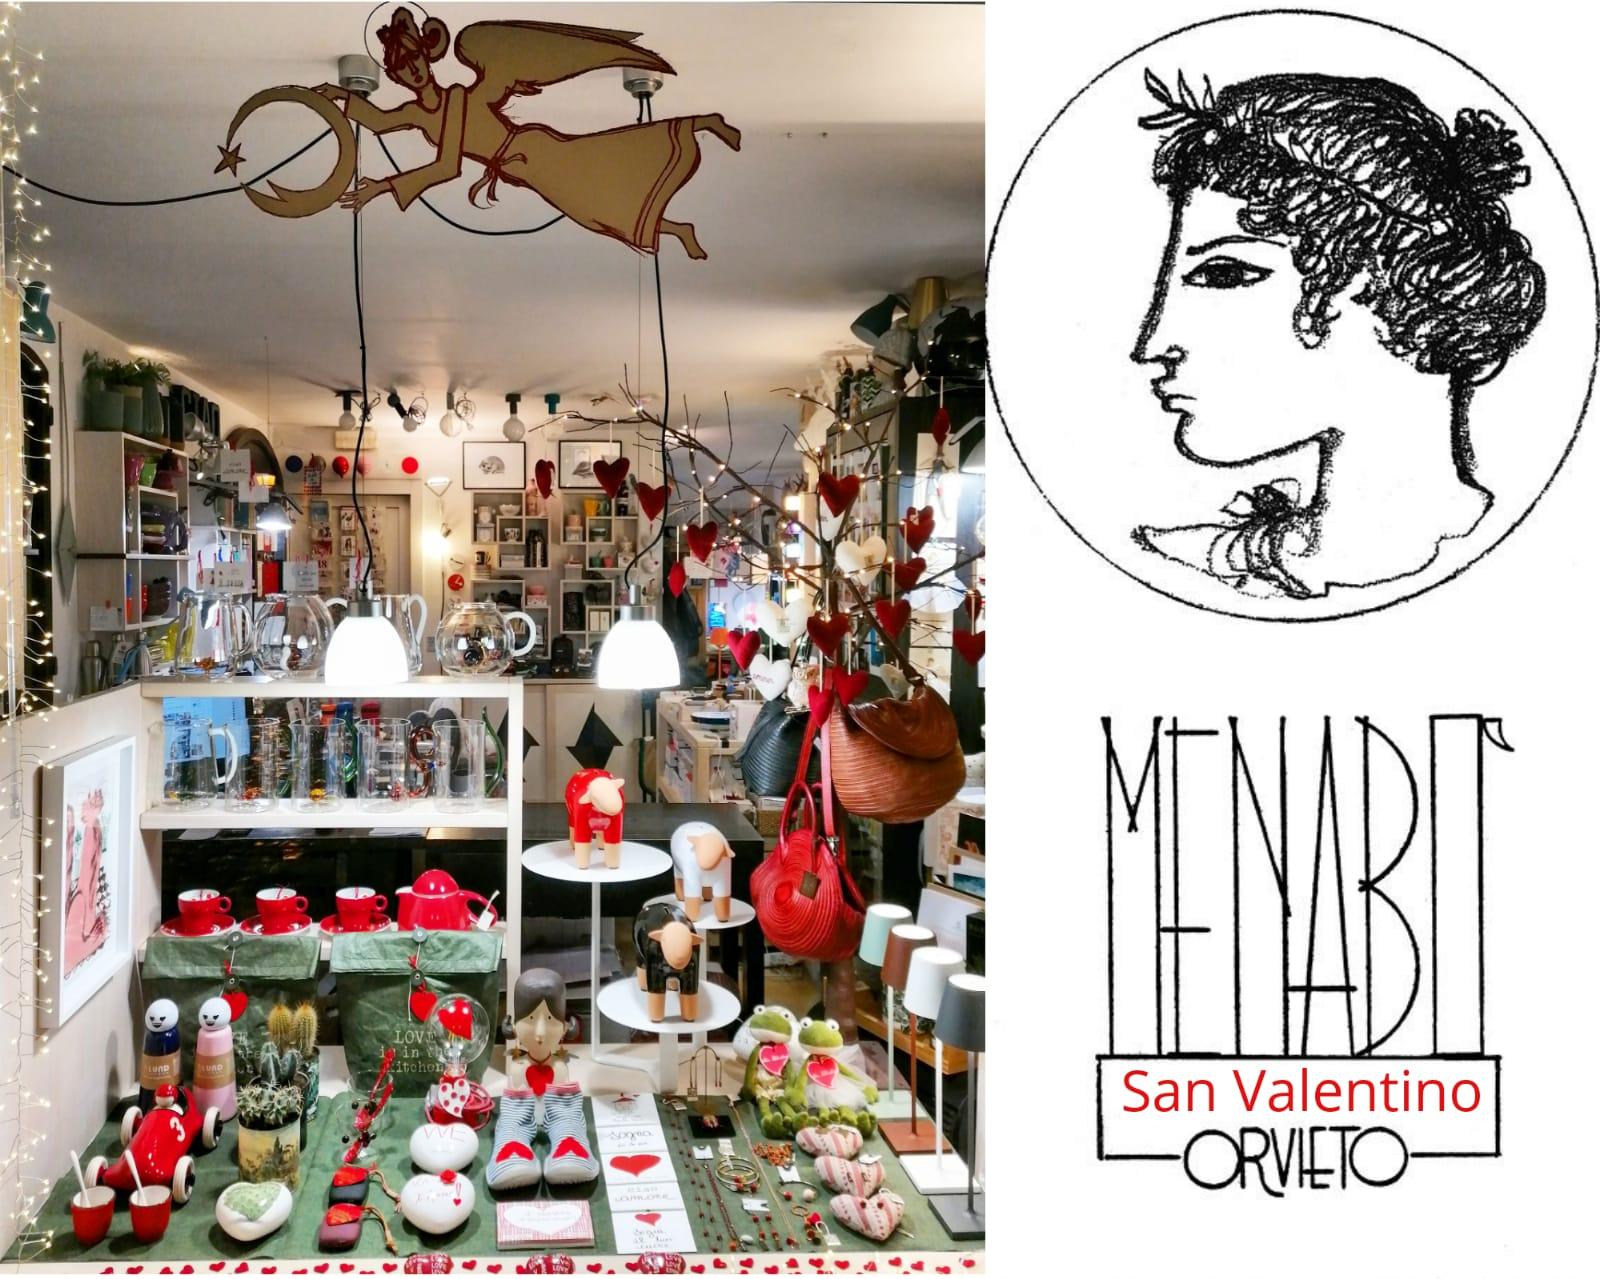 Idee regalo ad Orvieto